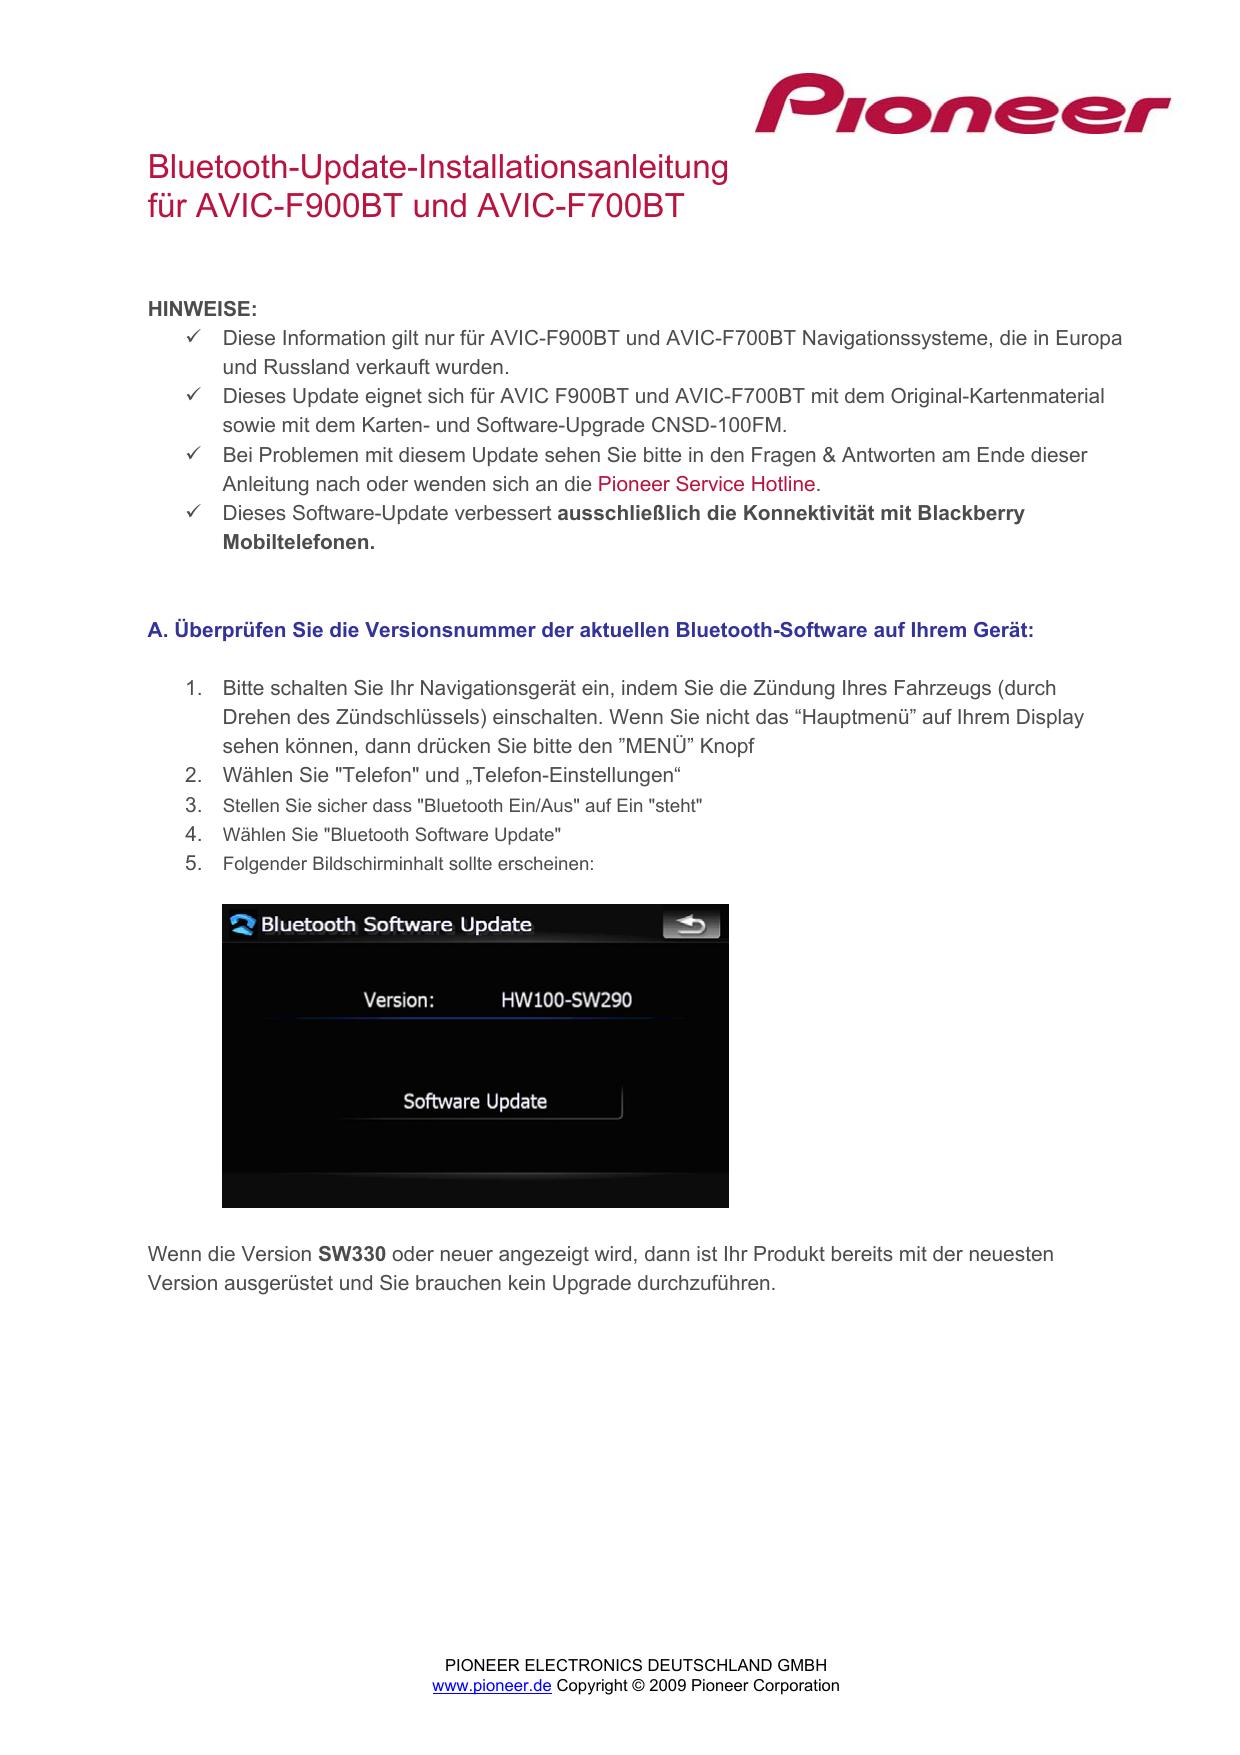 Pioneer Bluetooth Software Update